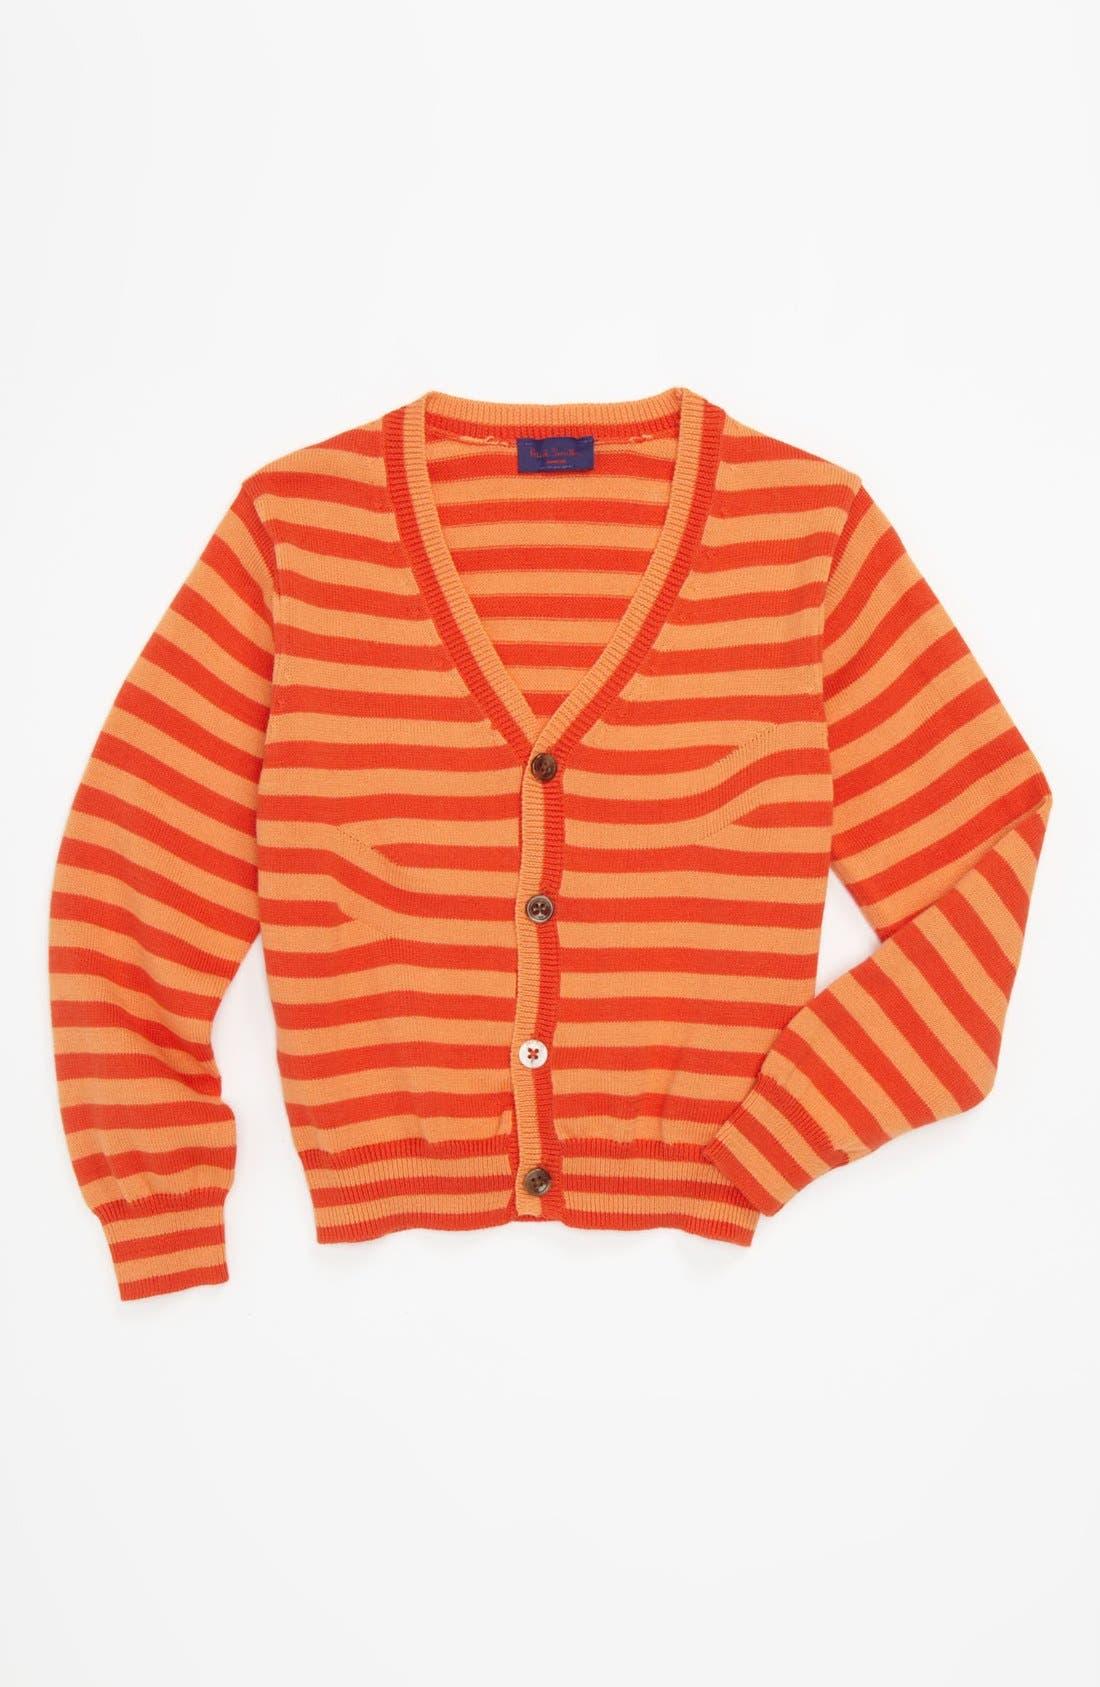 Main Image - Paul Smith Junior Stripe Cardigan (Toddler)